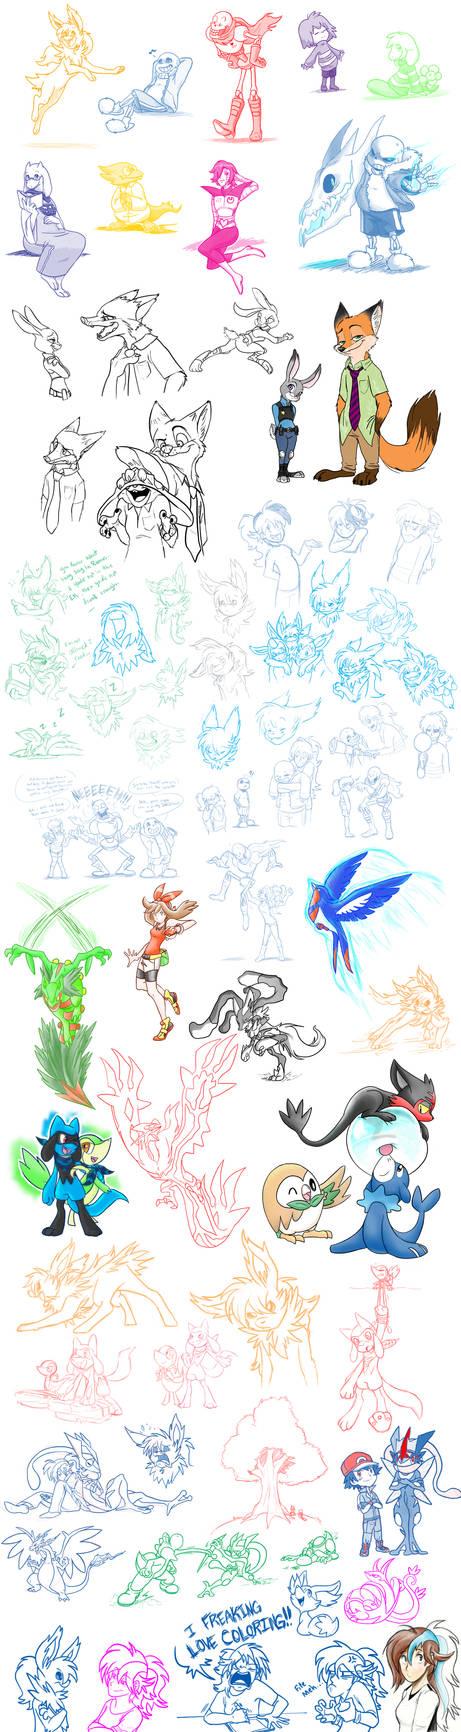 Yay Doodles! :D